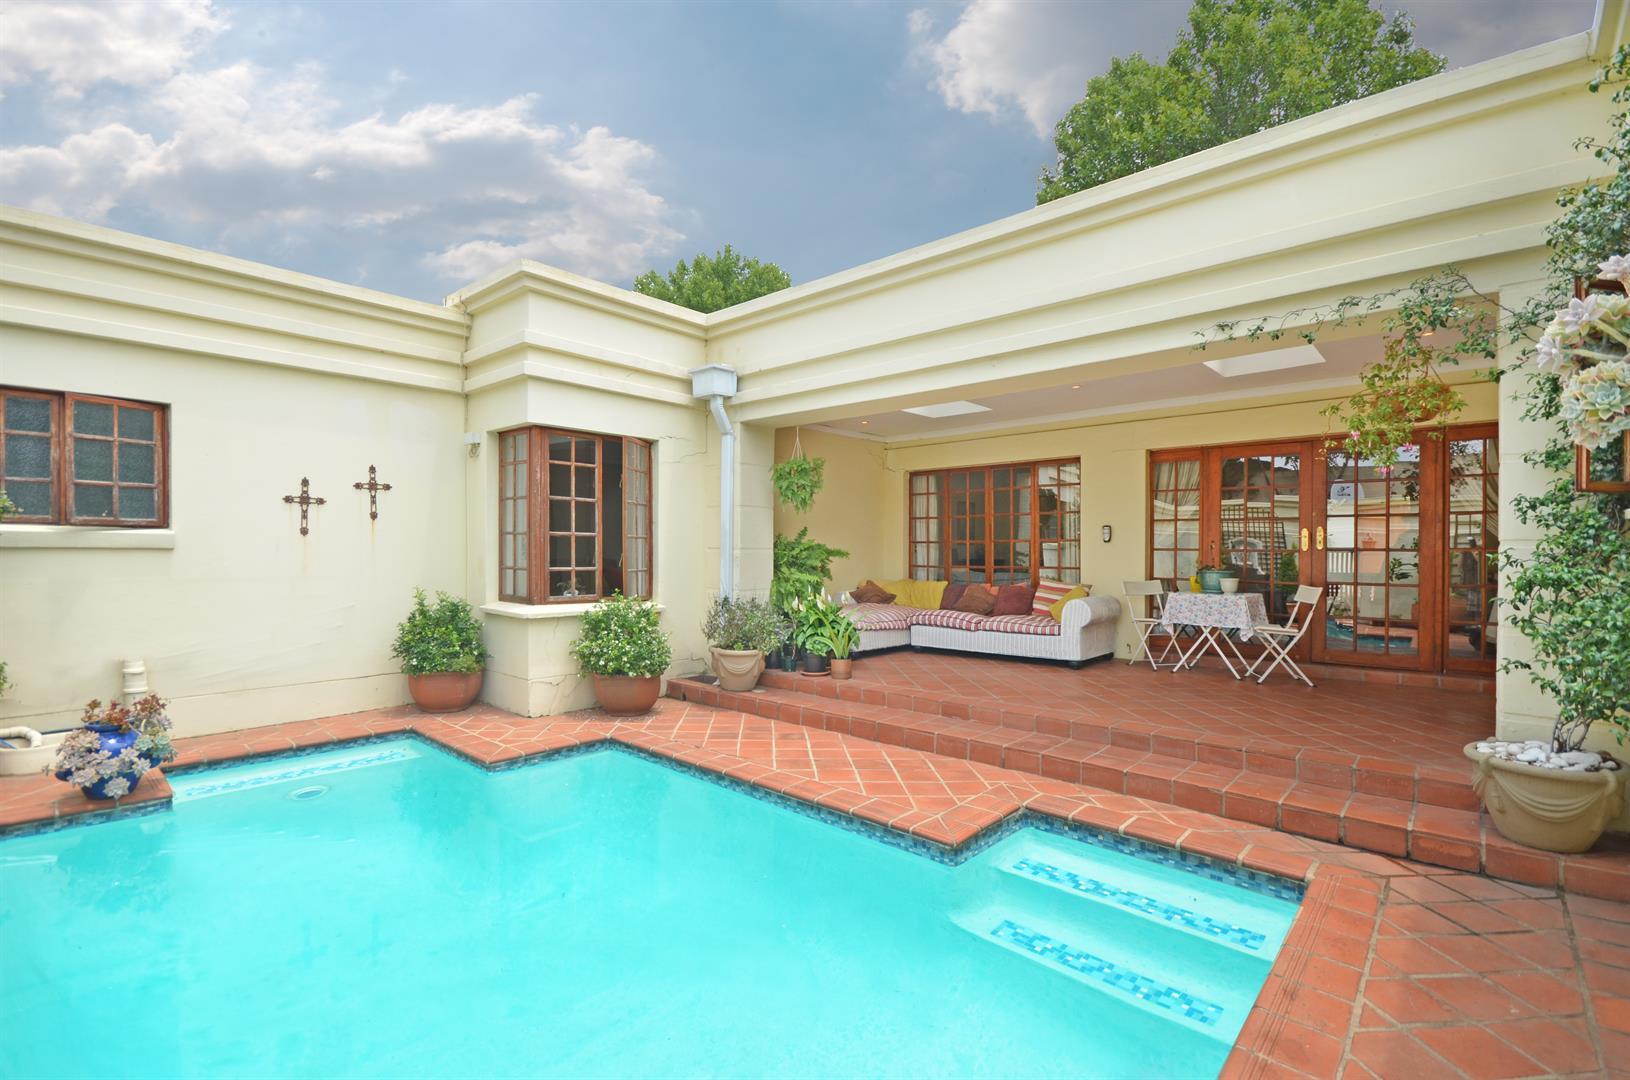 Johannesburg, Parkhurst Property  | Houses For Sale Parkhurst, Parkhurst, House 2 bedrooms property for sale Price:2,695,000